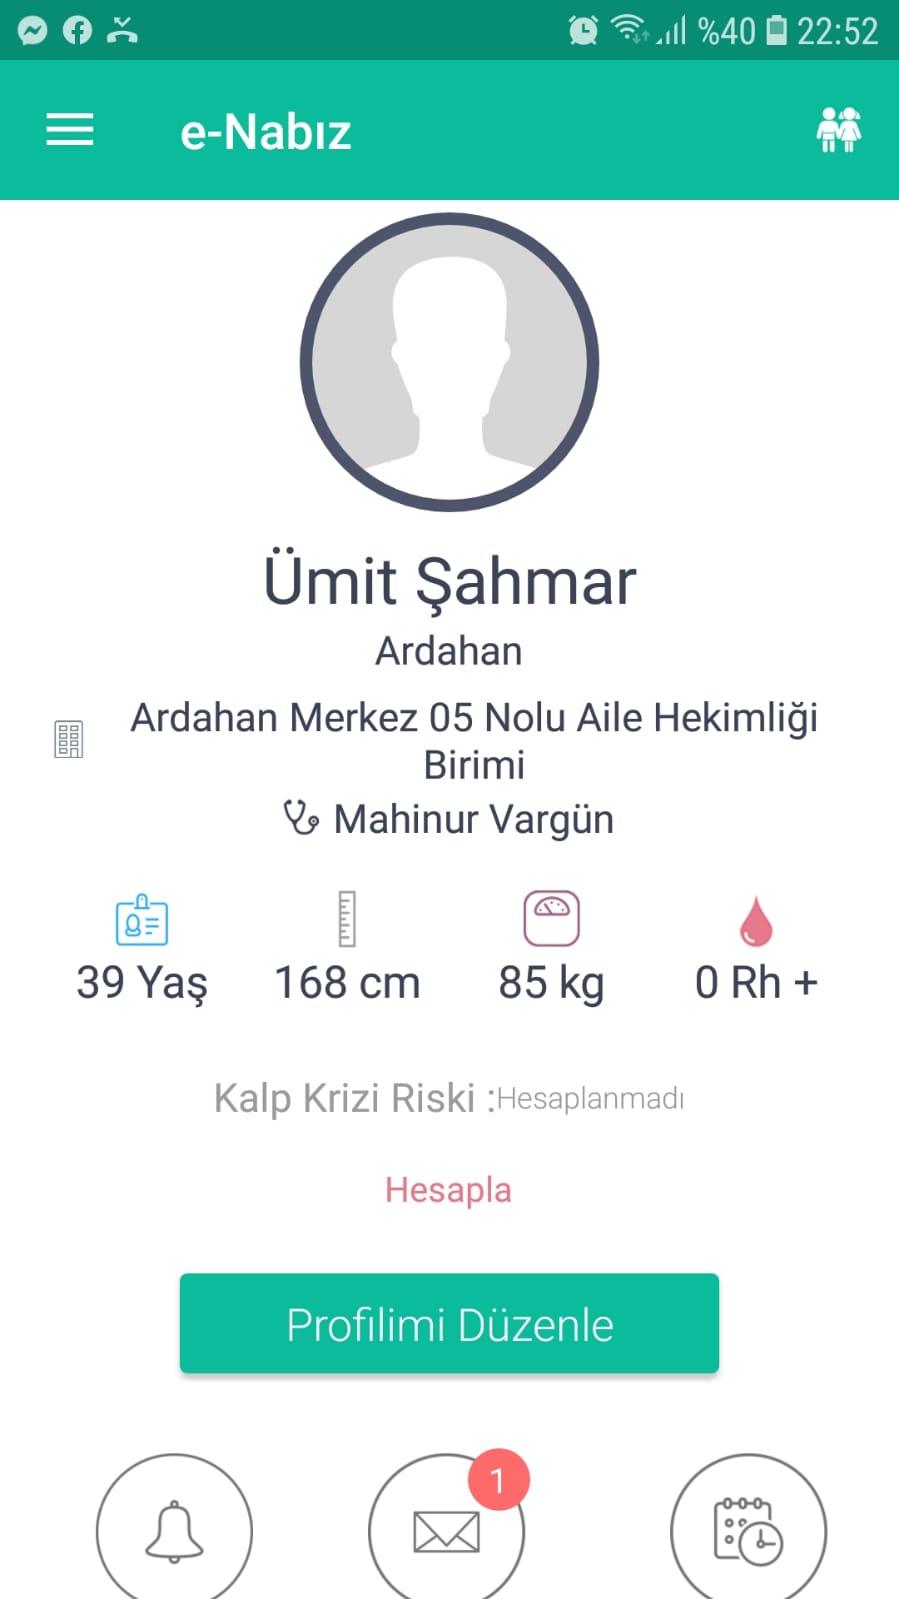 2020/05/1590247064_umit_sahmar_ardahan.jpg